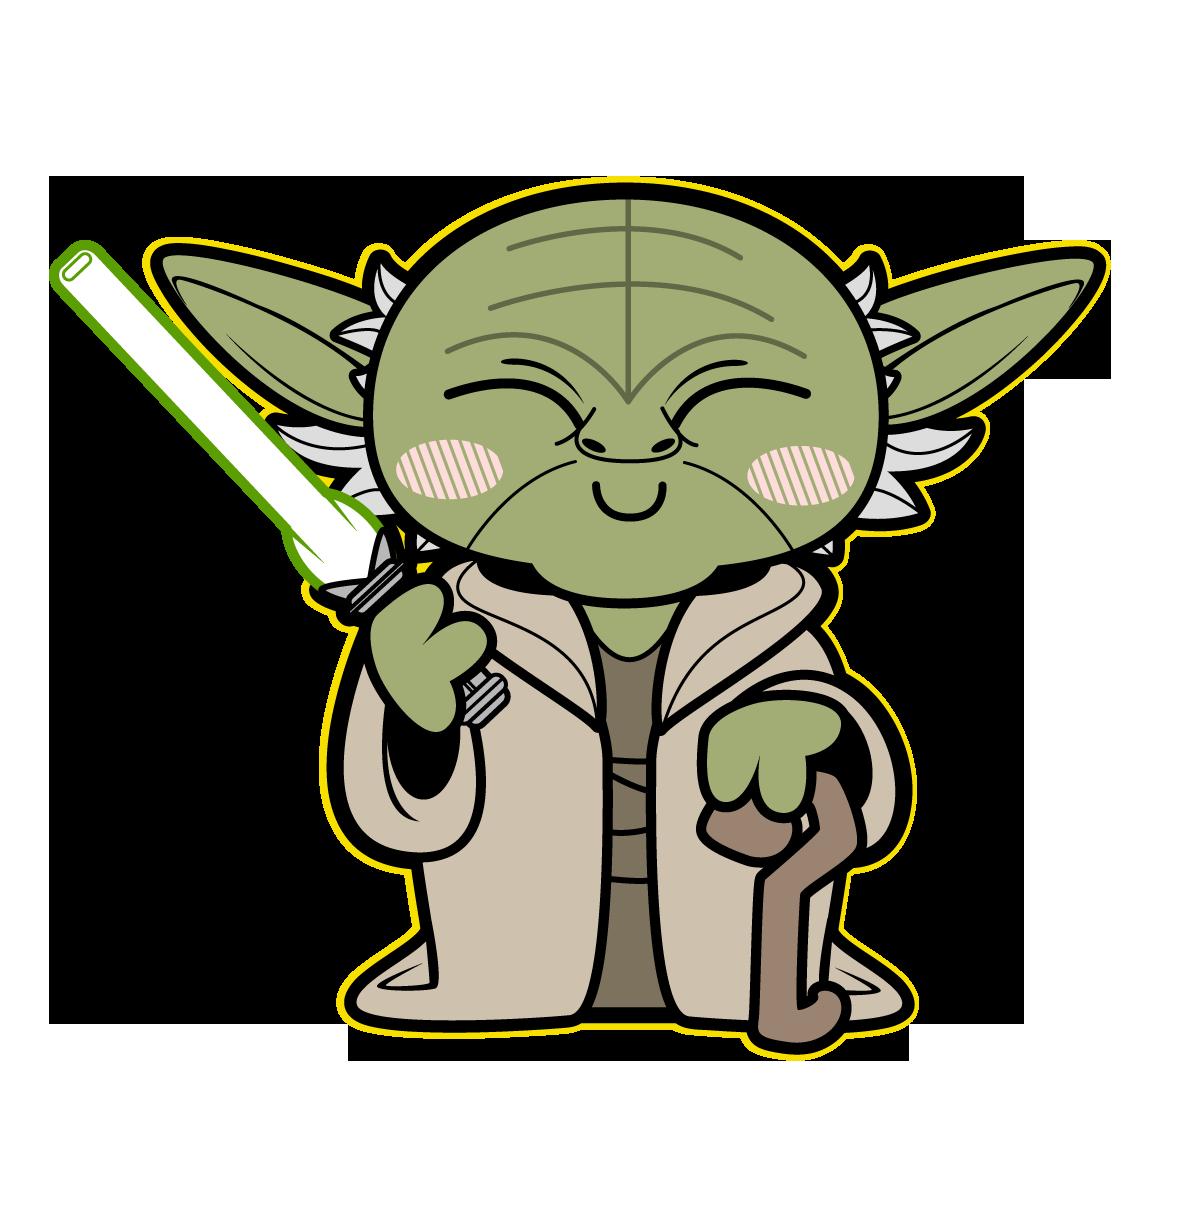 Star wars starbucks clipart clip art library download yoda | TieFighters | Star Wars | Pinterest | Star, Starwars and Chibi clip art library download